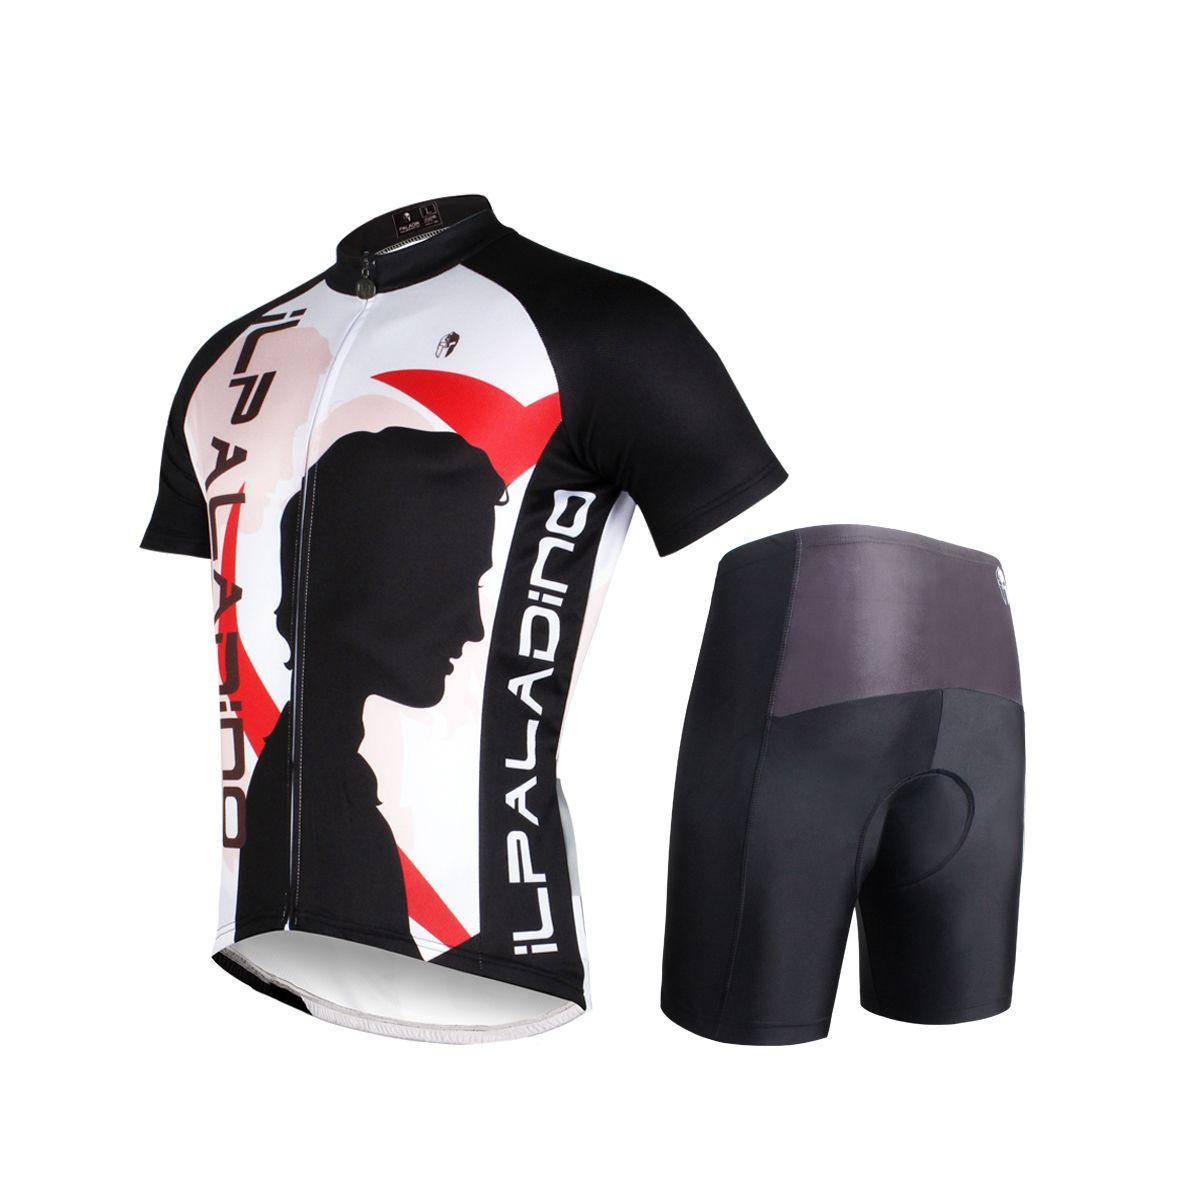 Great Cycling Kits Wacky Cycling Jerseys Comedy Cycling Jerseys